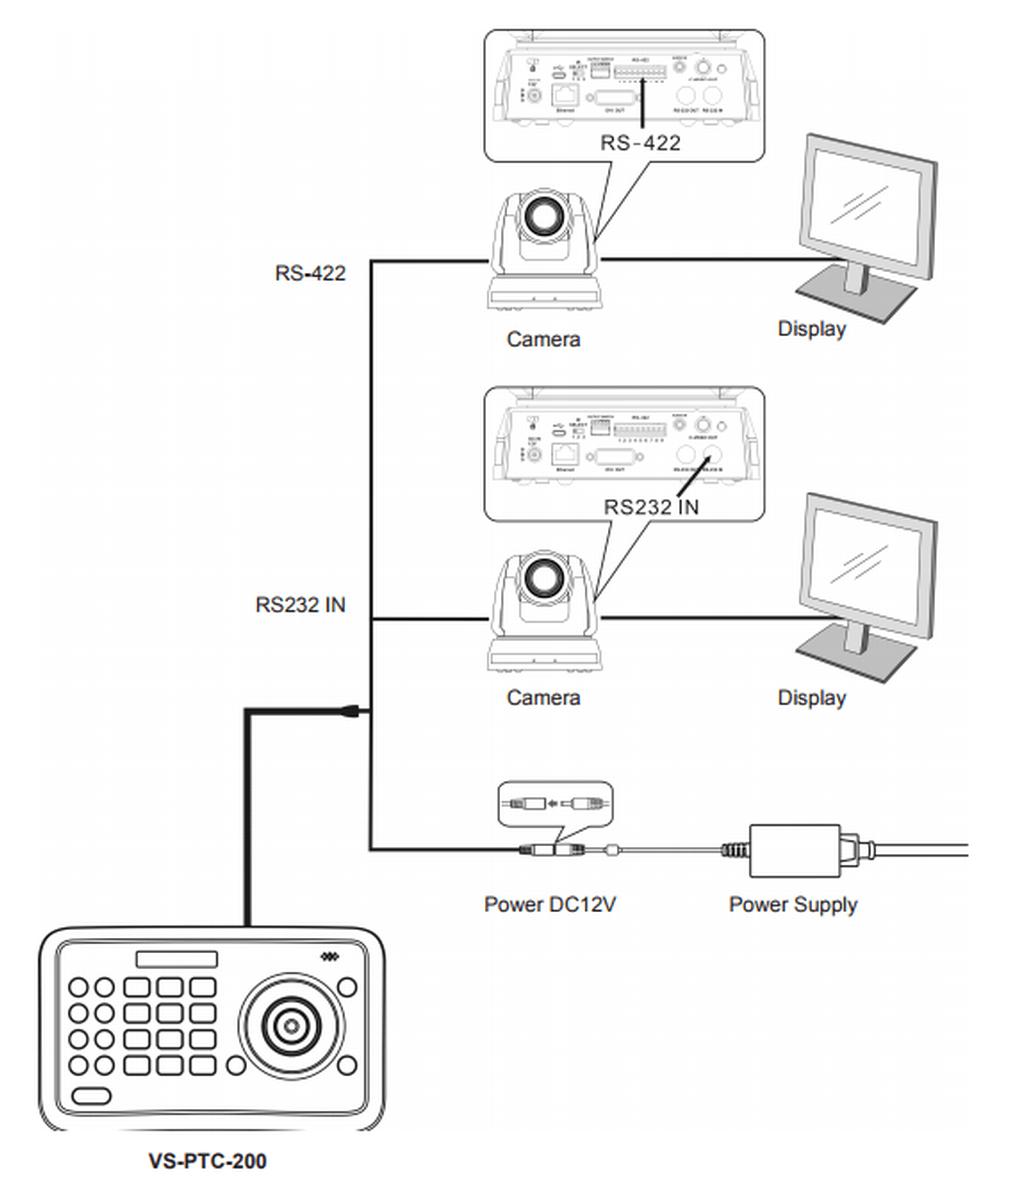 Marshall VS-PTC-200 Compact PTZ Joystick Controller, 4D